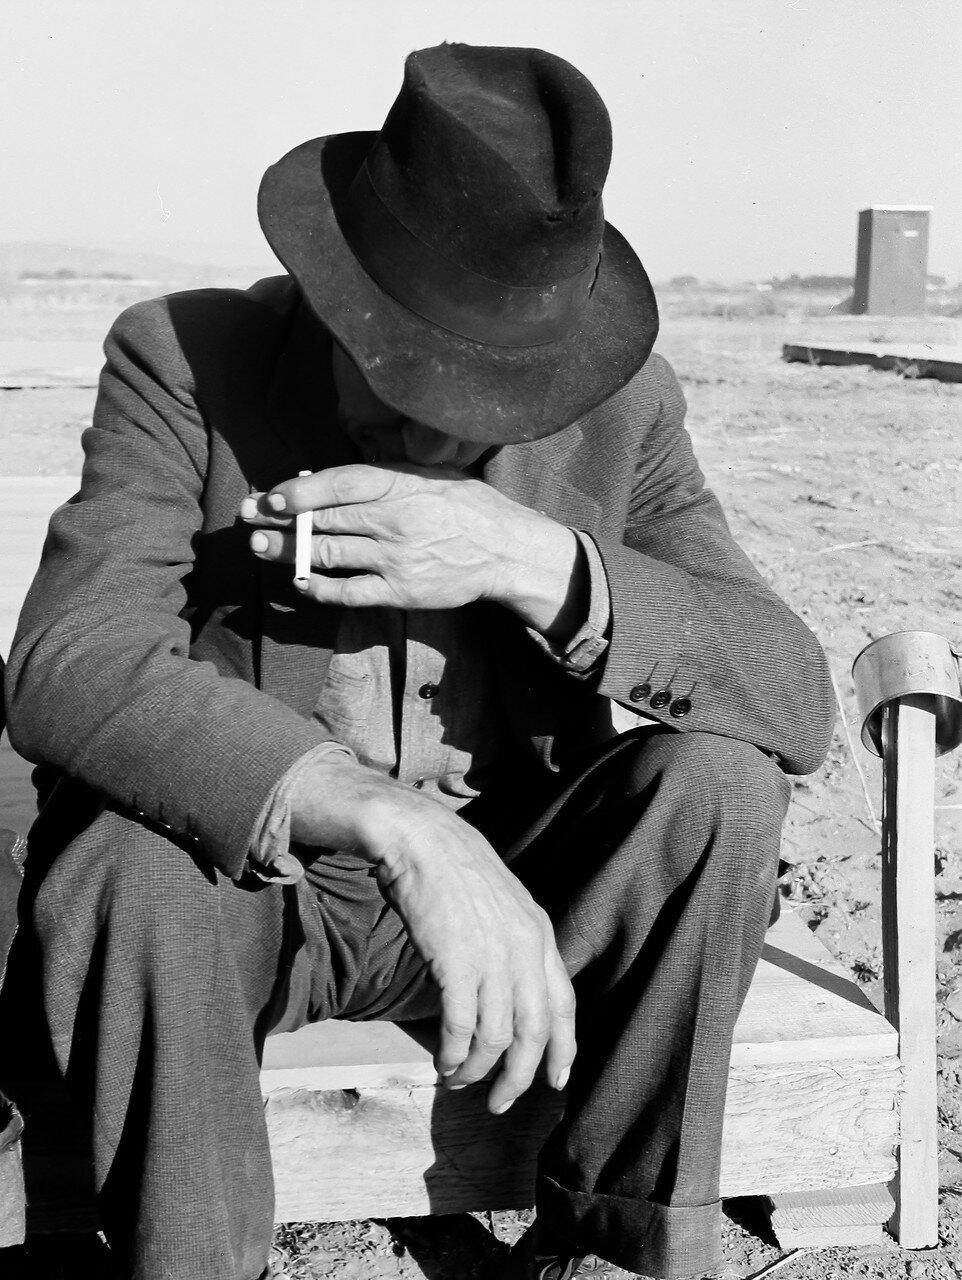 1939. Бывший фермер из Небраски, сейчас мигрант. Орегон